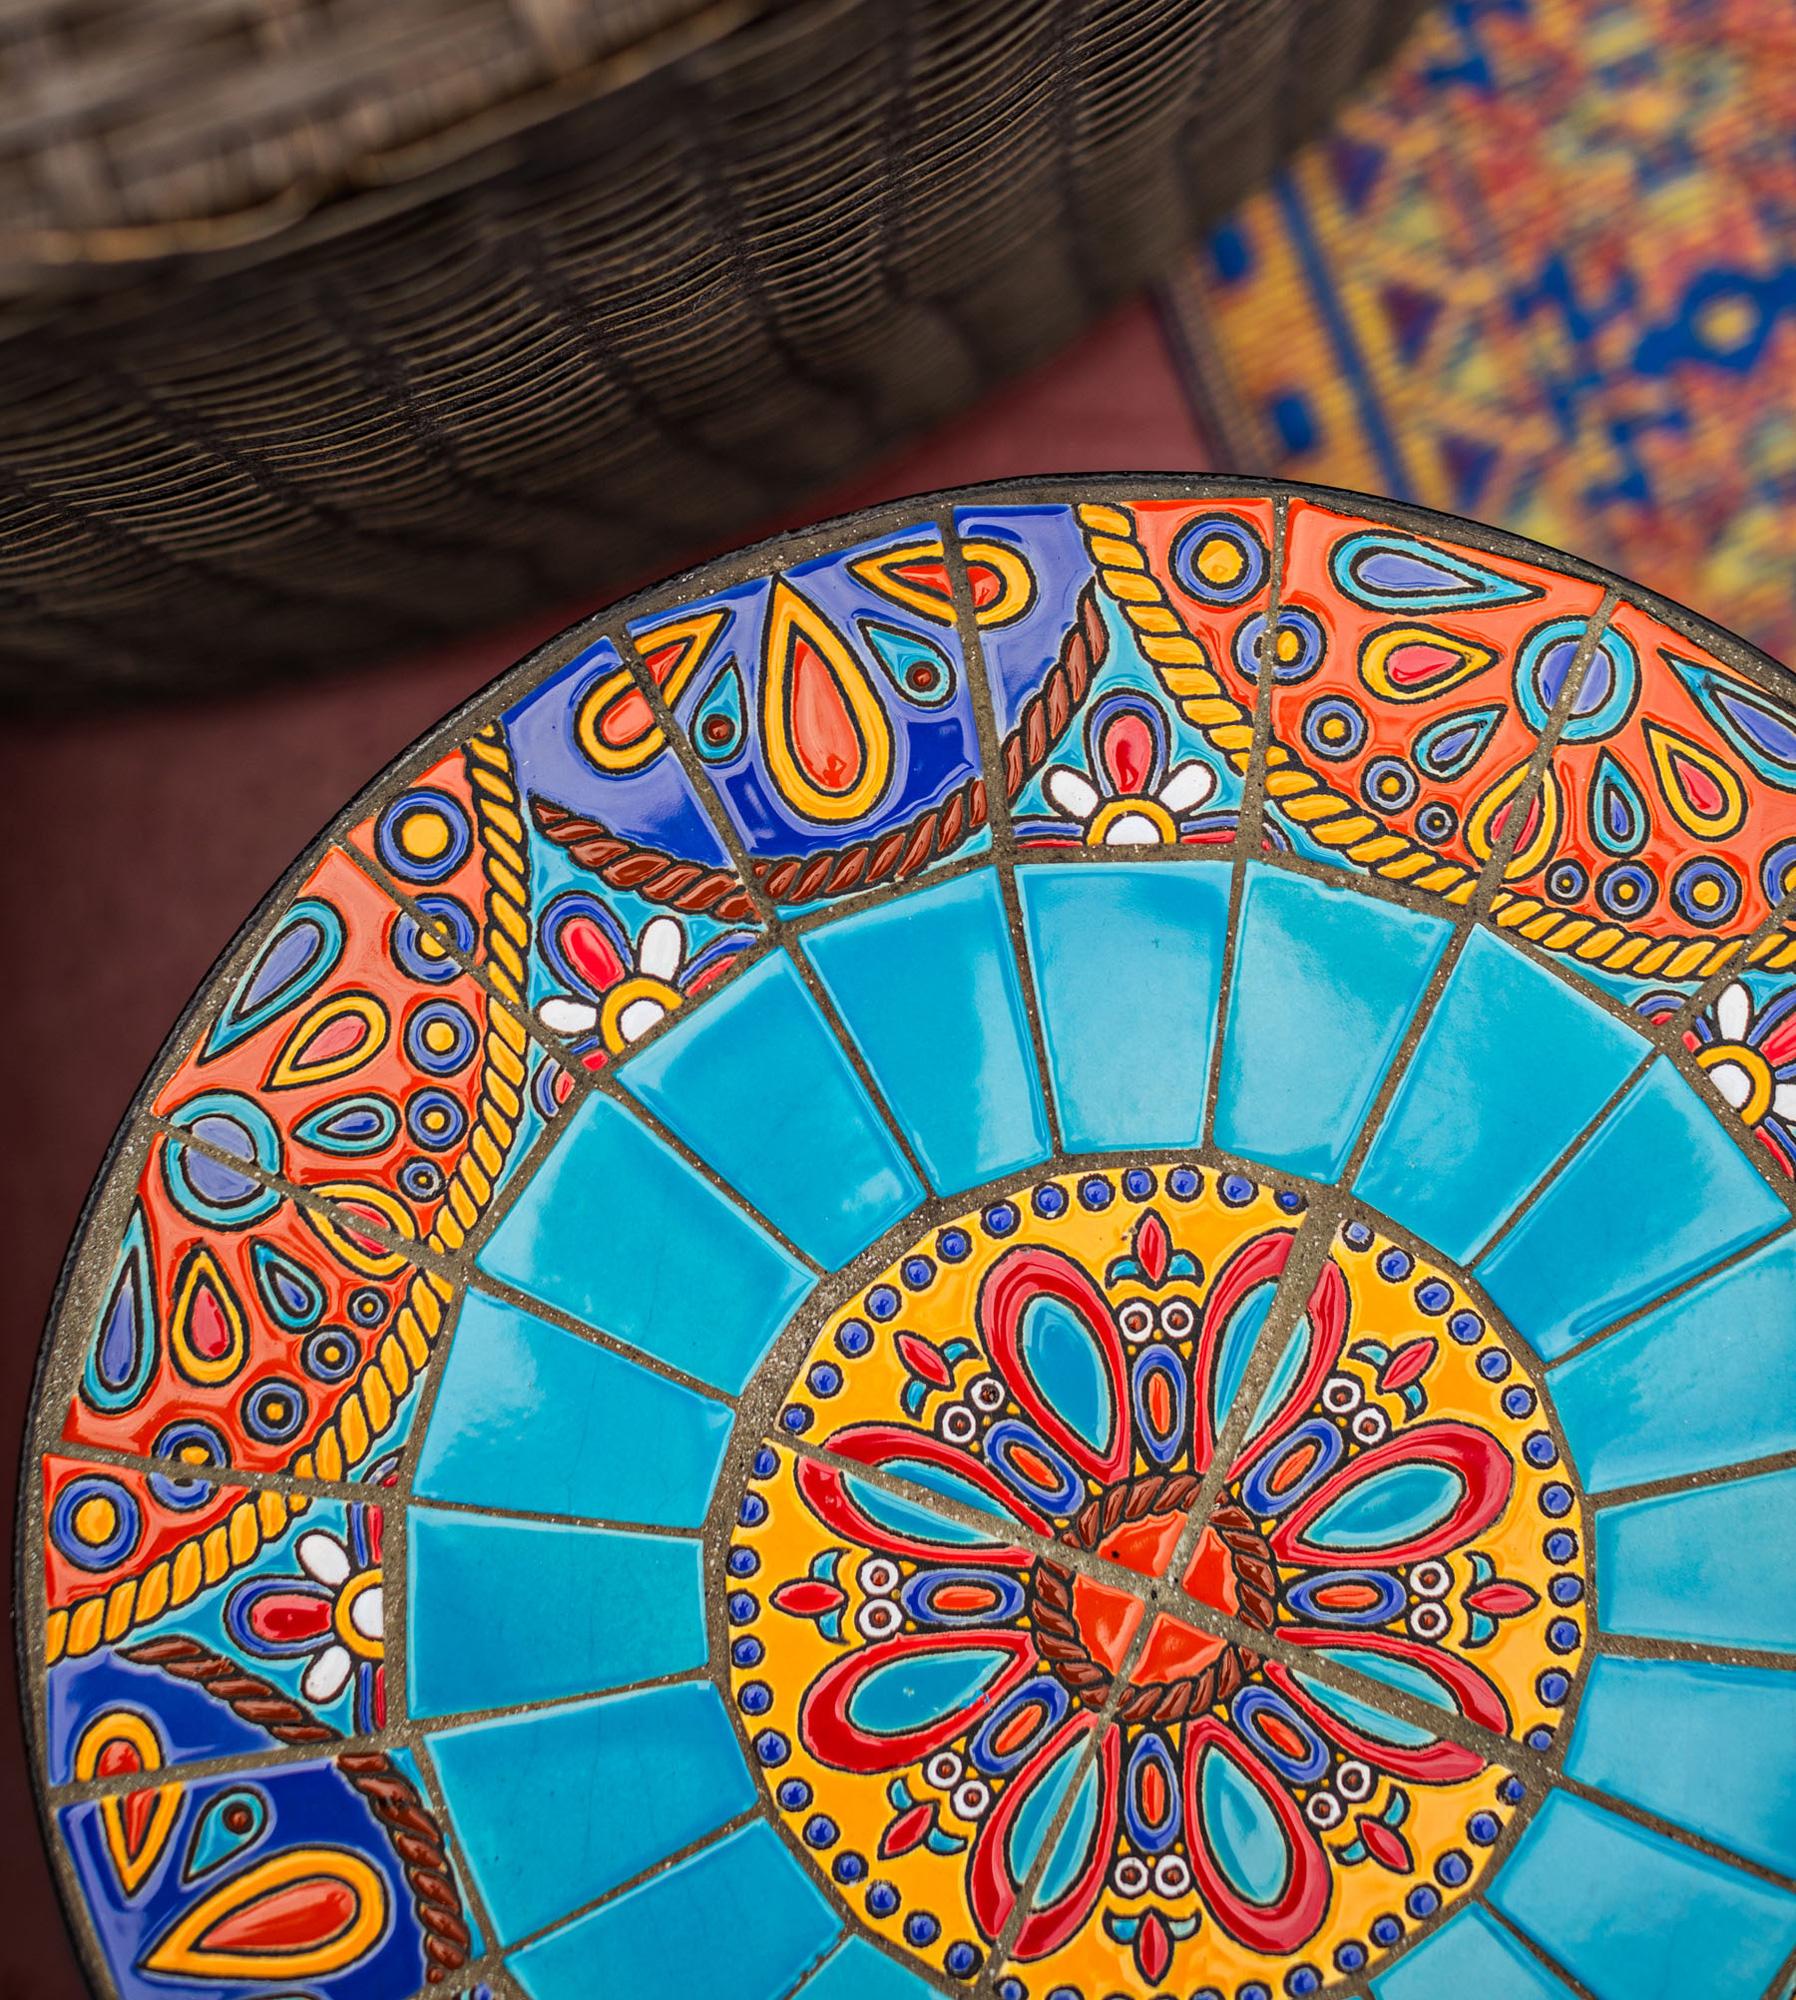 Mosaic-tile tabletop